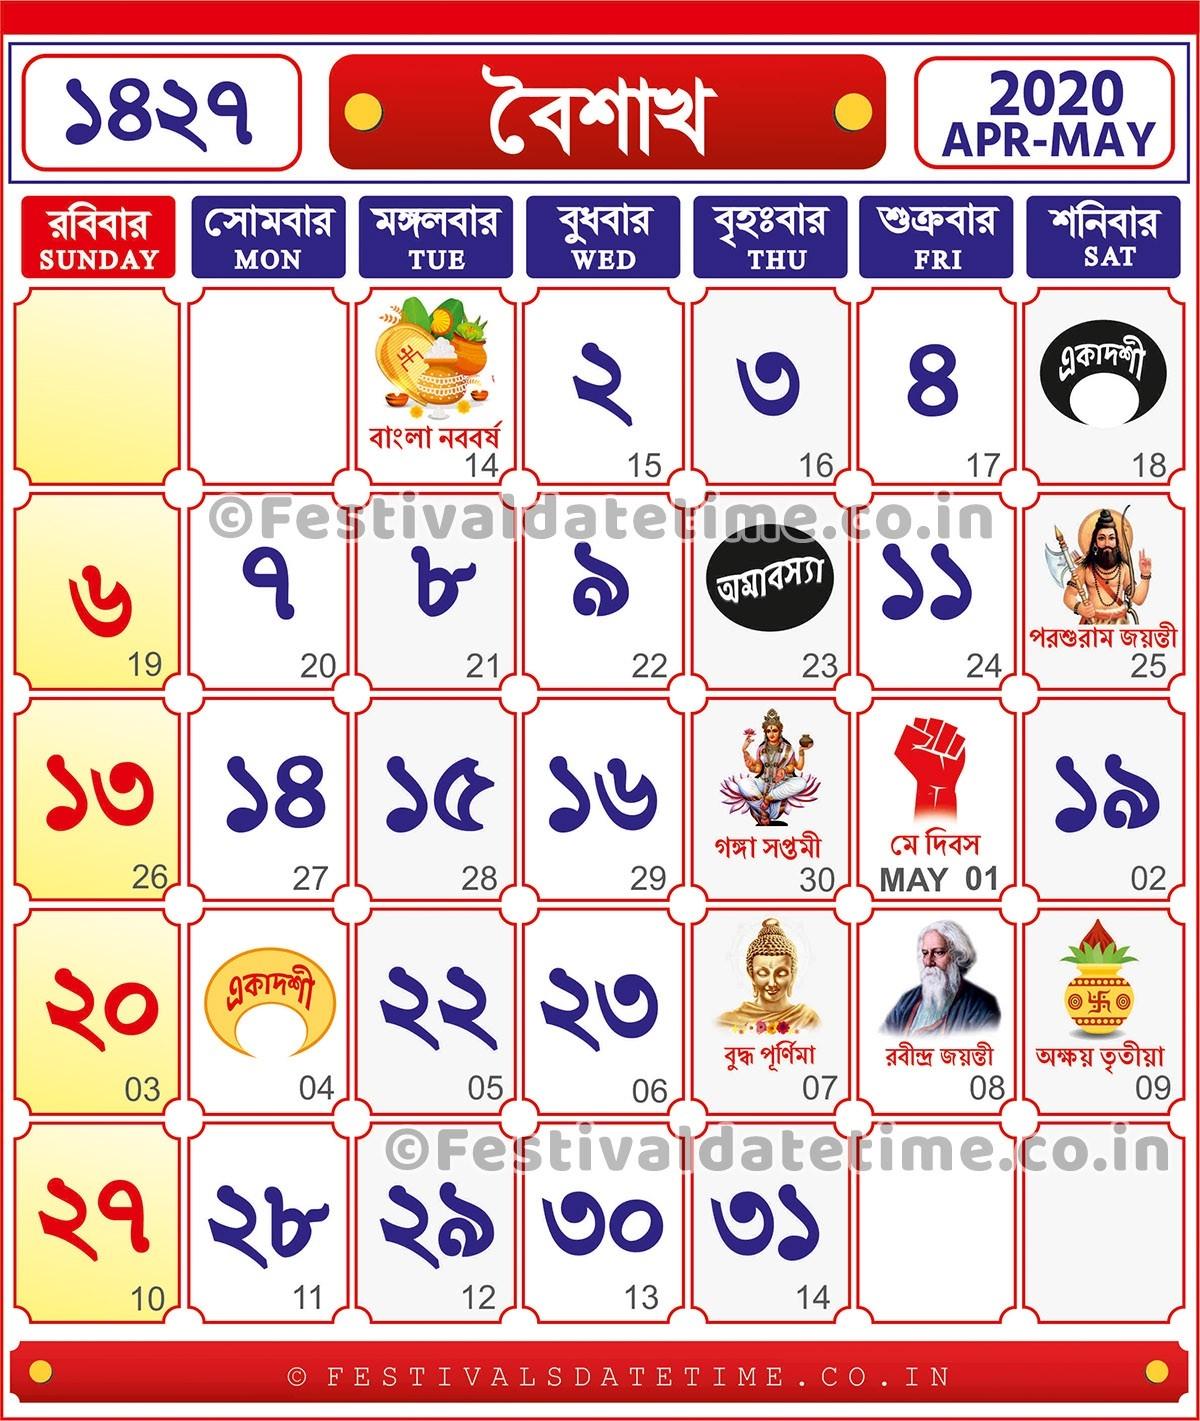 1427 Bengali Calendar - Baisakh 1427, 2020 & 2021 Bengali-January 2020 Calendar Amavasya